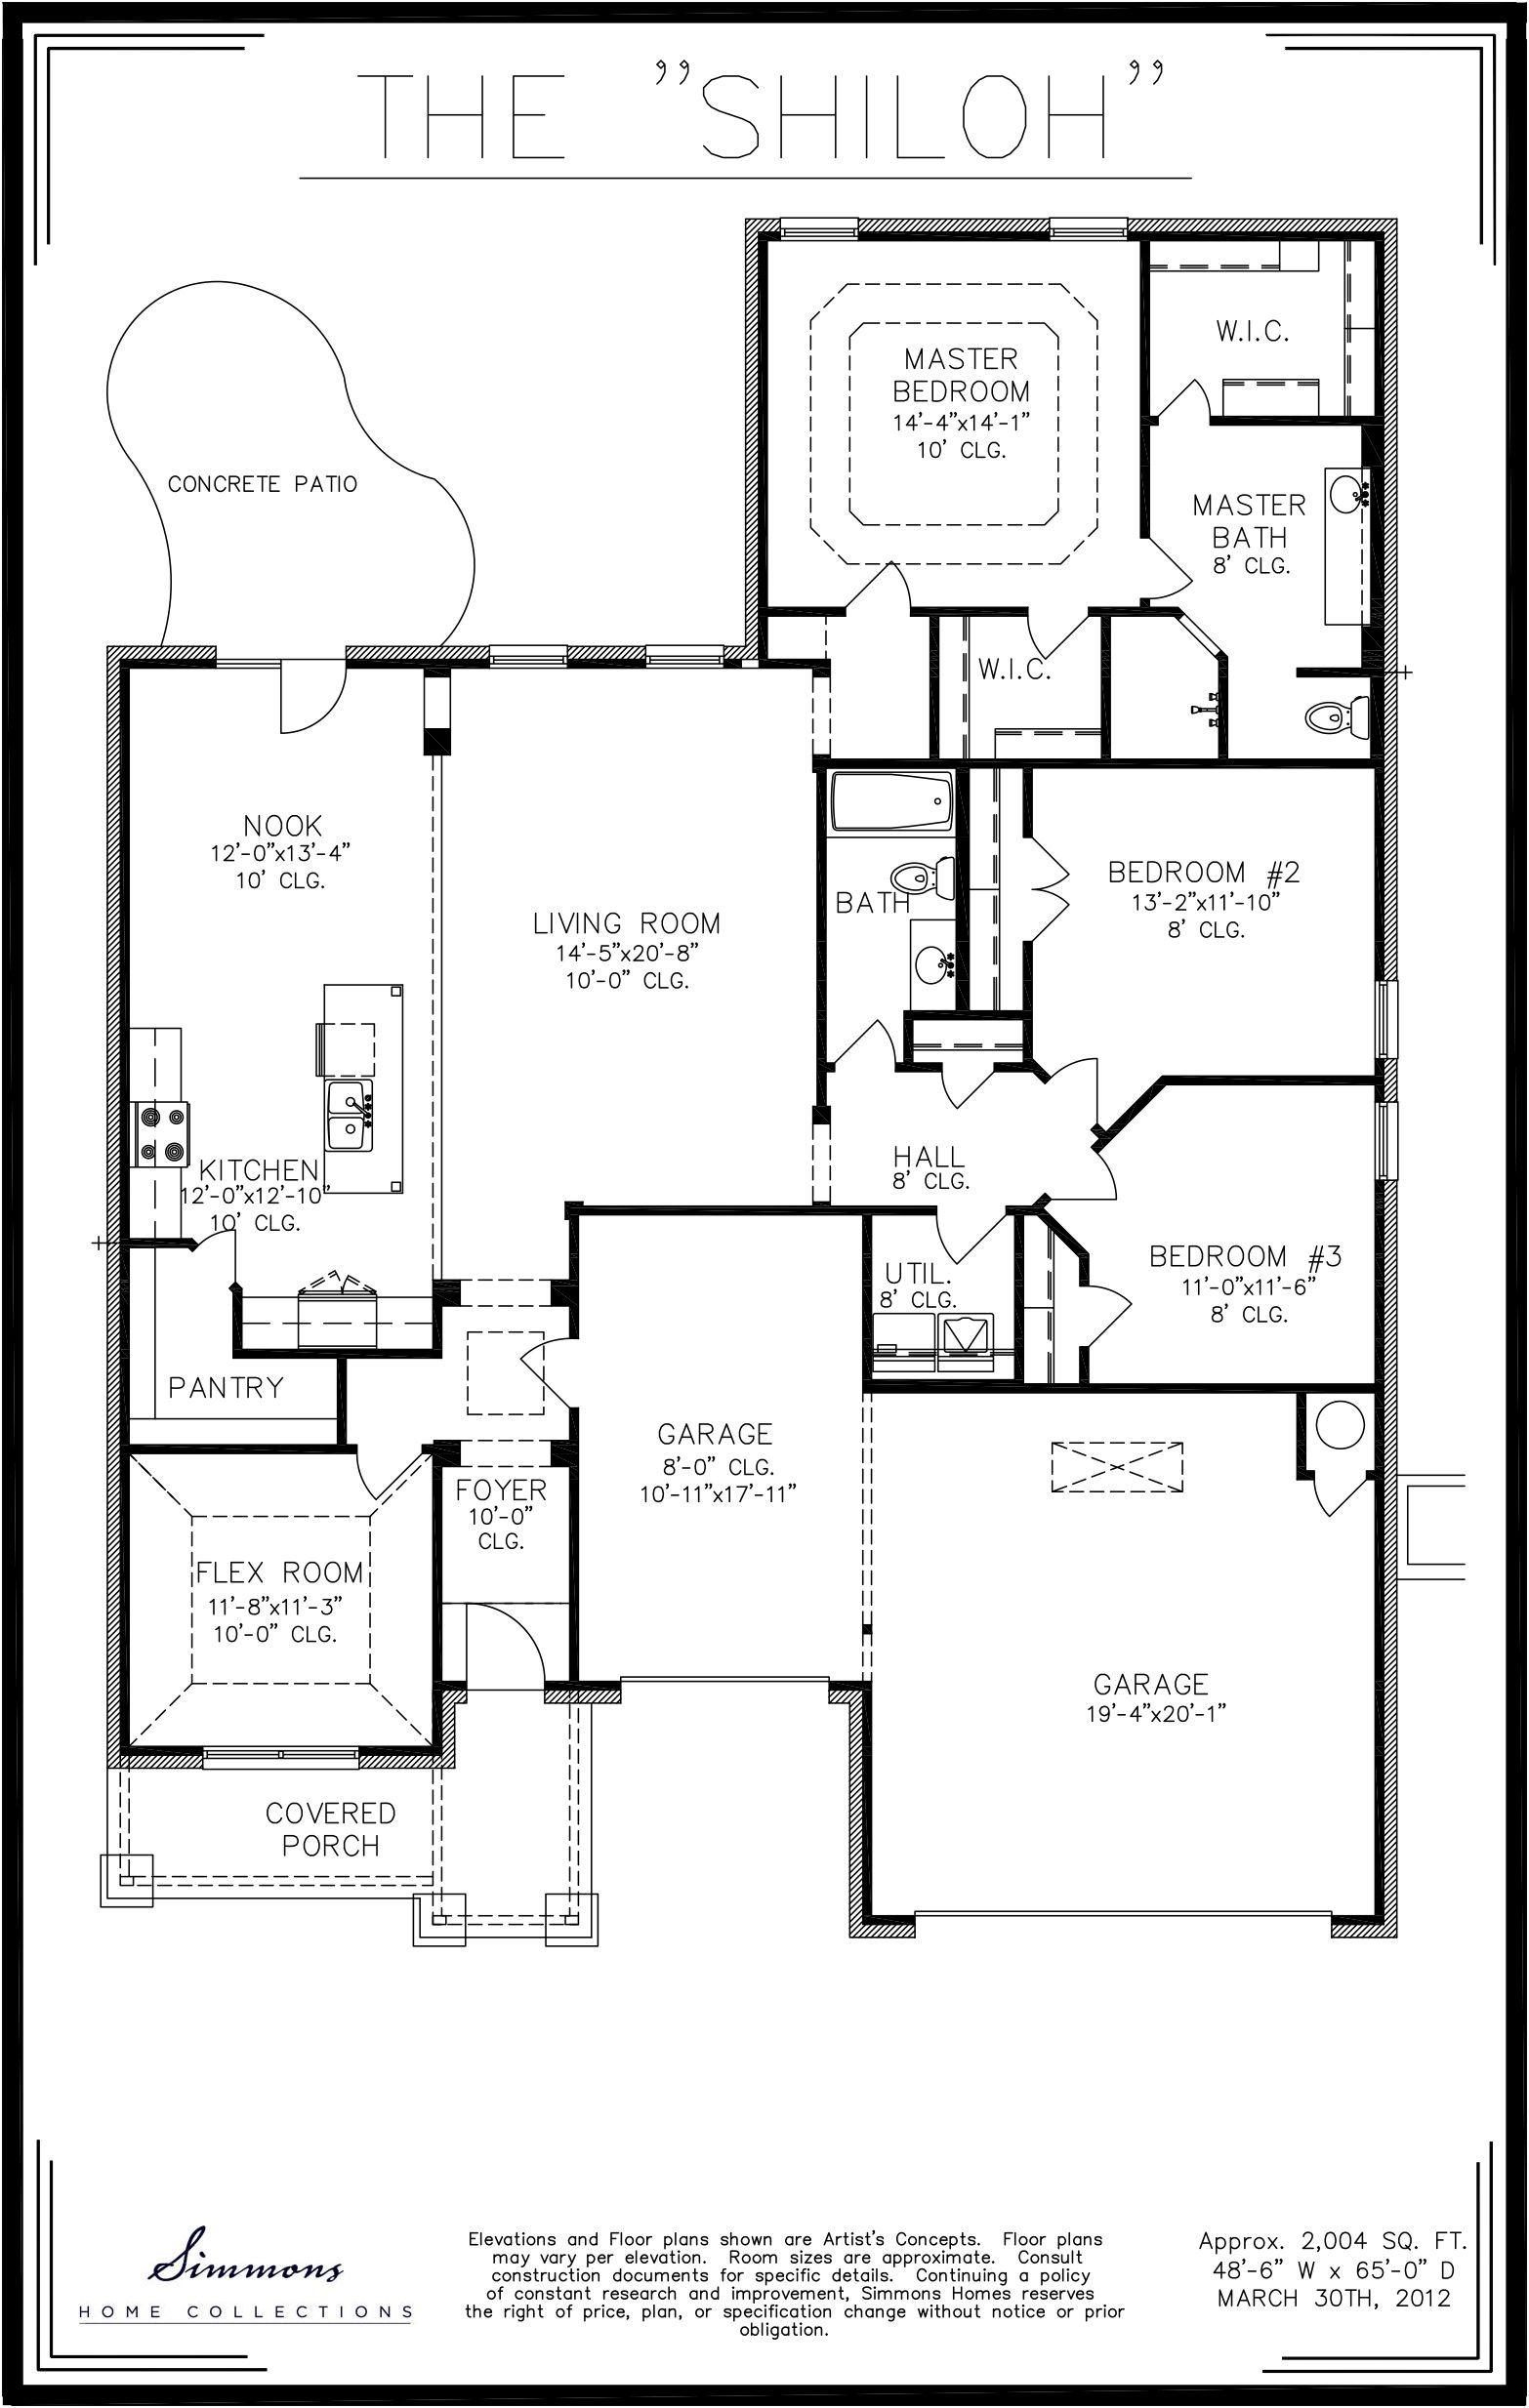 Simmons Homes Shiloh Floor Plan 2 004 Sq Ft 3 Bedrooms 2 Baths 3 Car Garage New Homes Tulsa Oklahoma Home Floor Plans Whitehall House Floor Plans